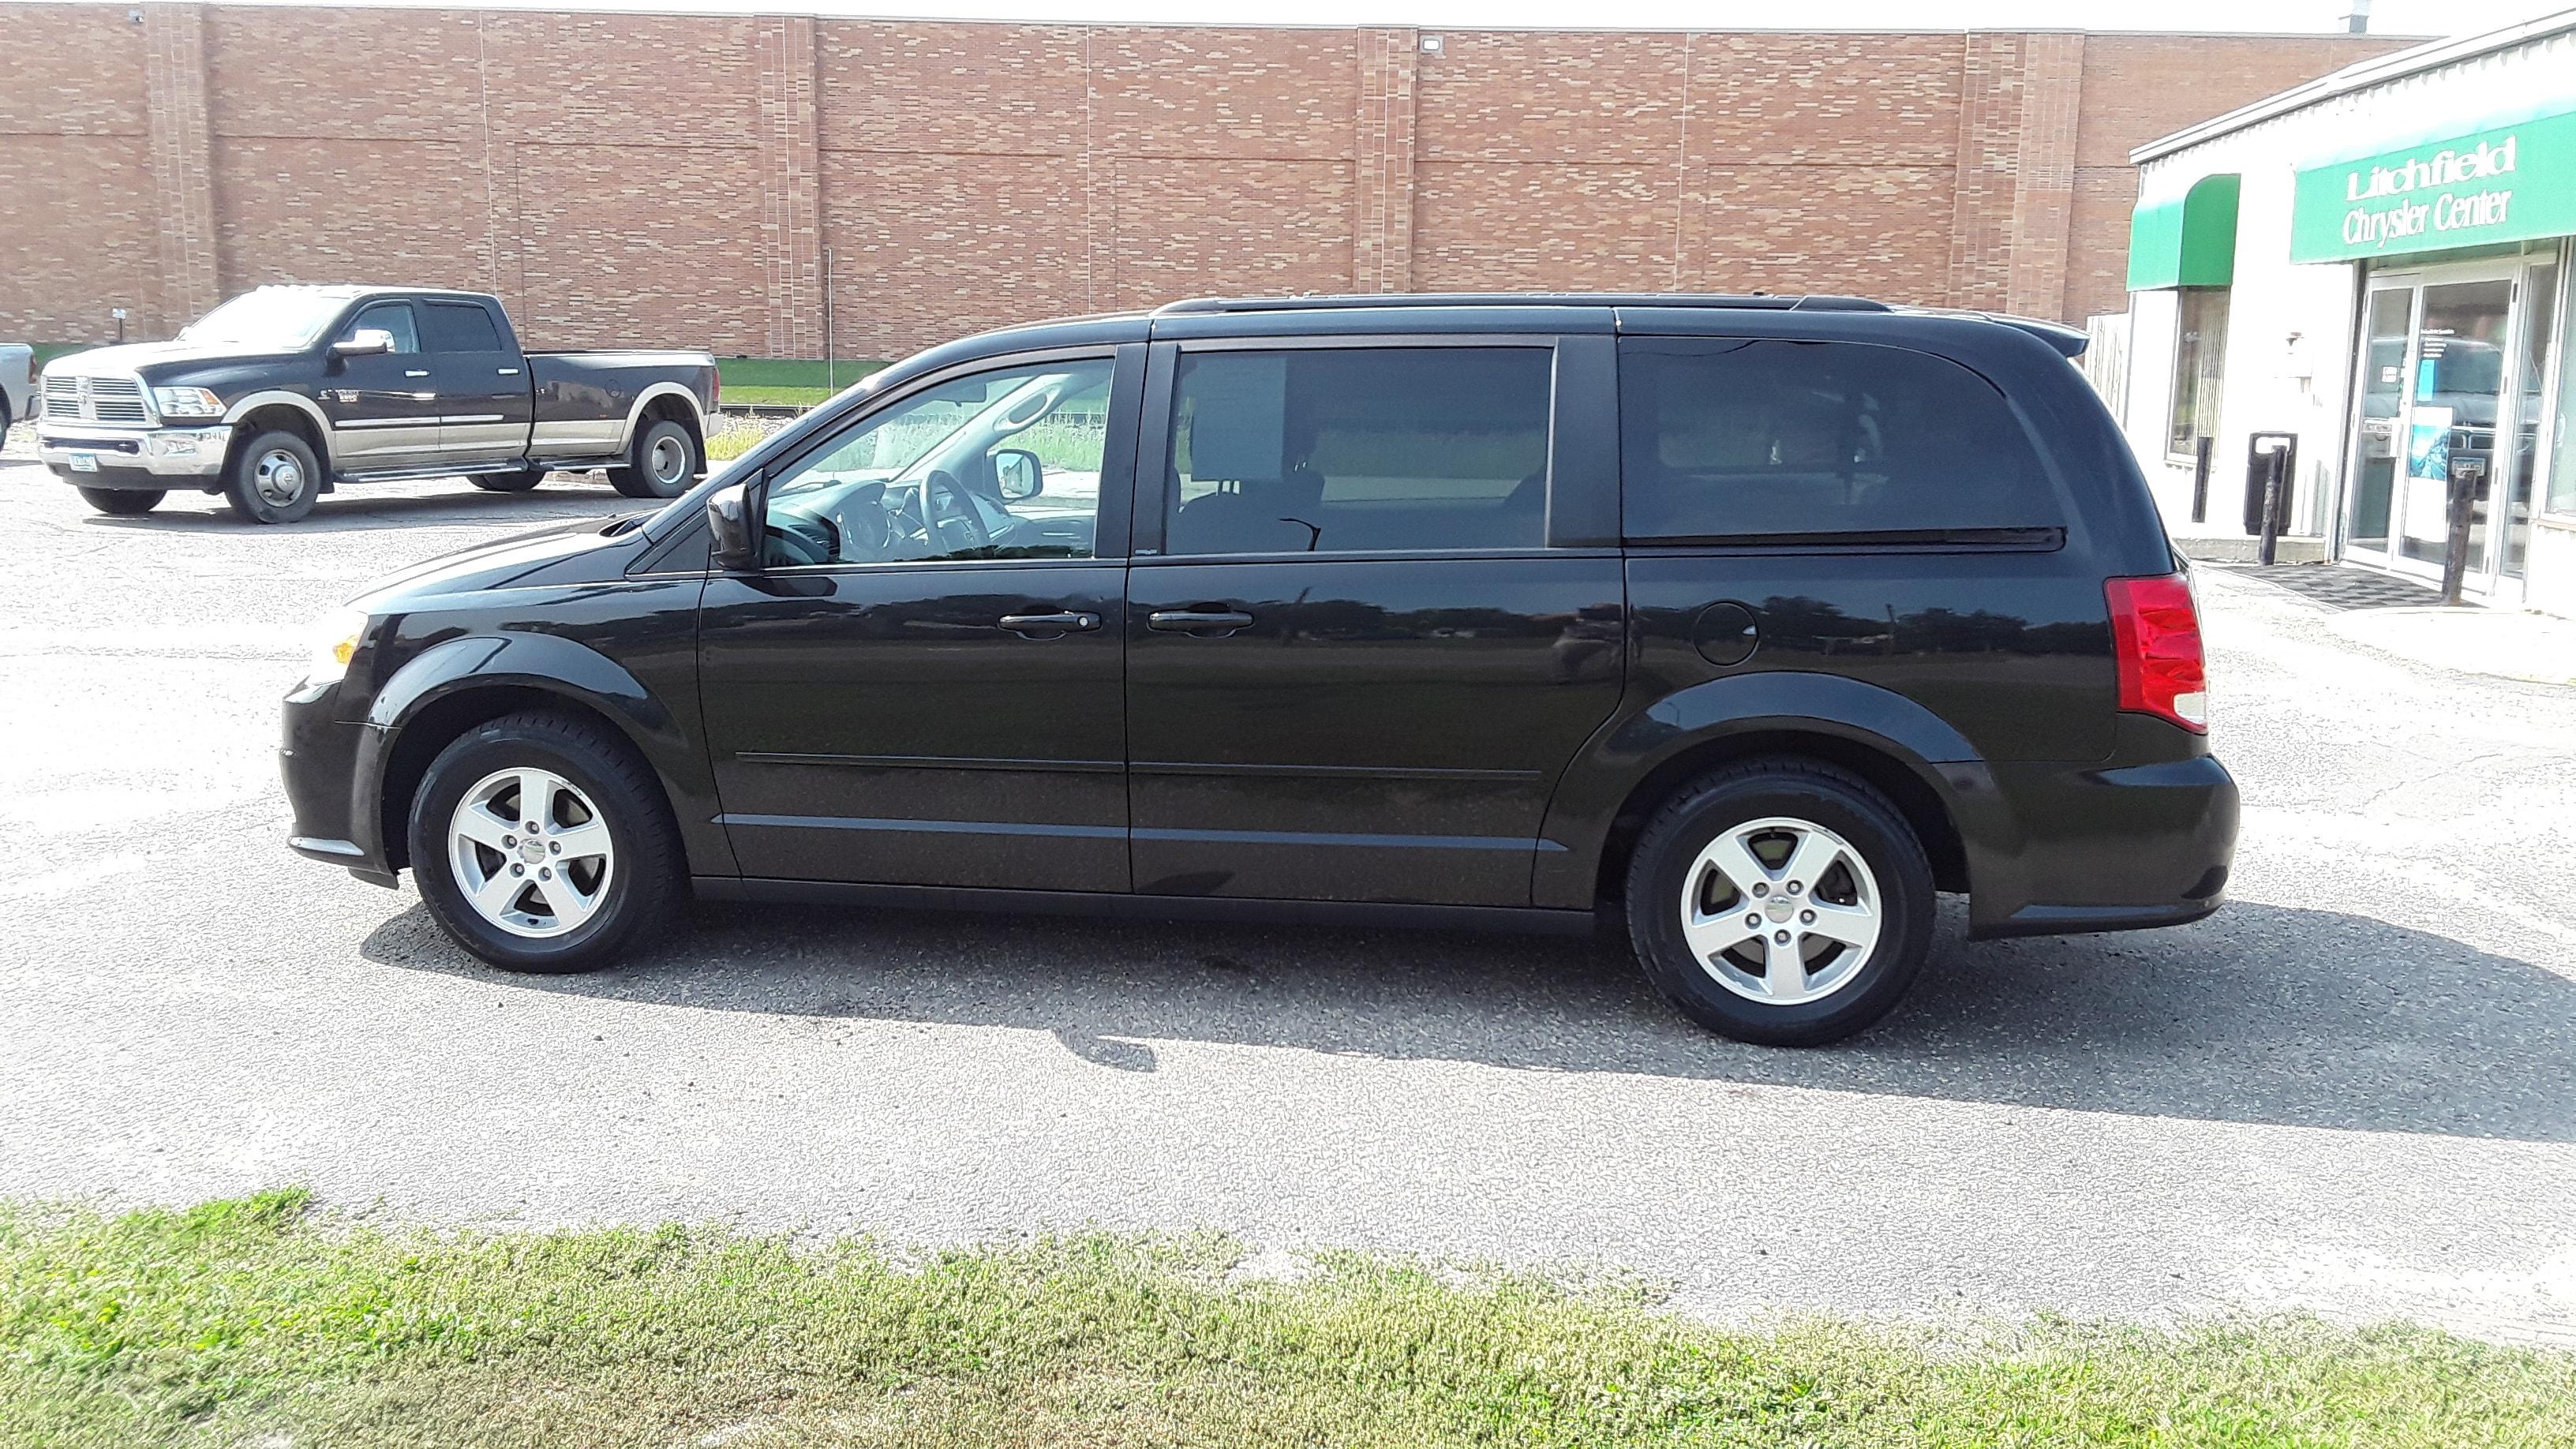 Used 2012 Dodge Grand Caravan SXT with VIN 2C4RDGCGXCR112750 for sale in Litchfield, Minnesota